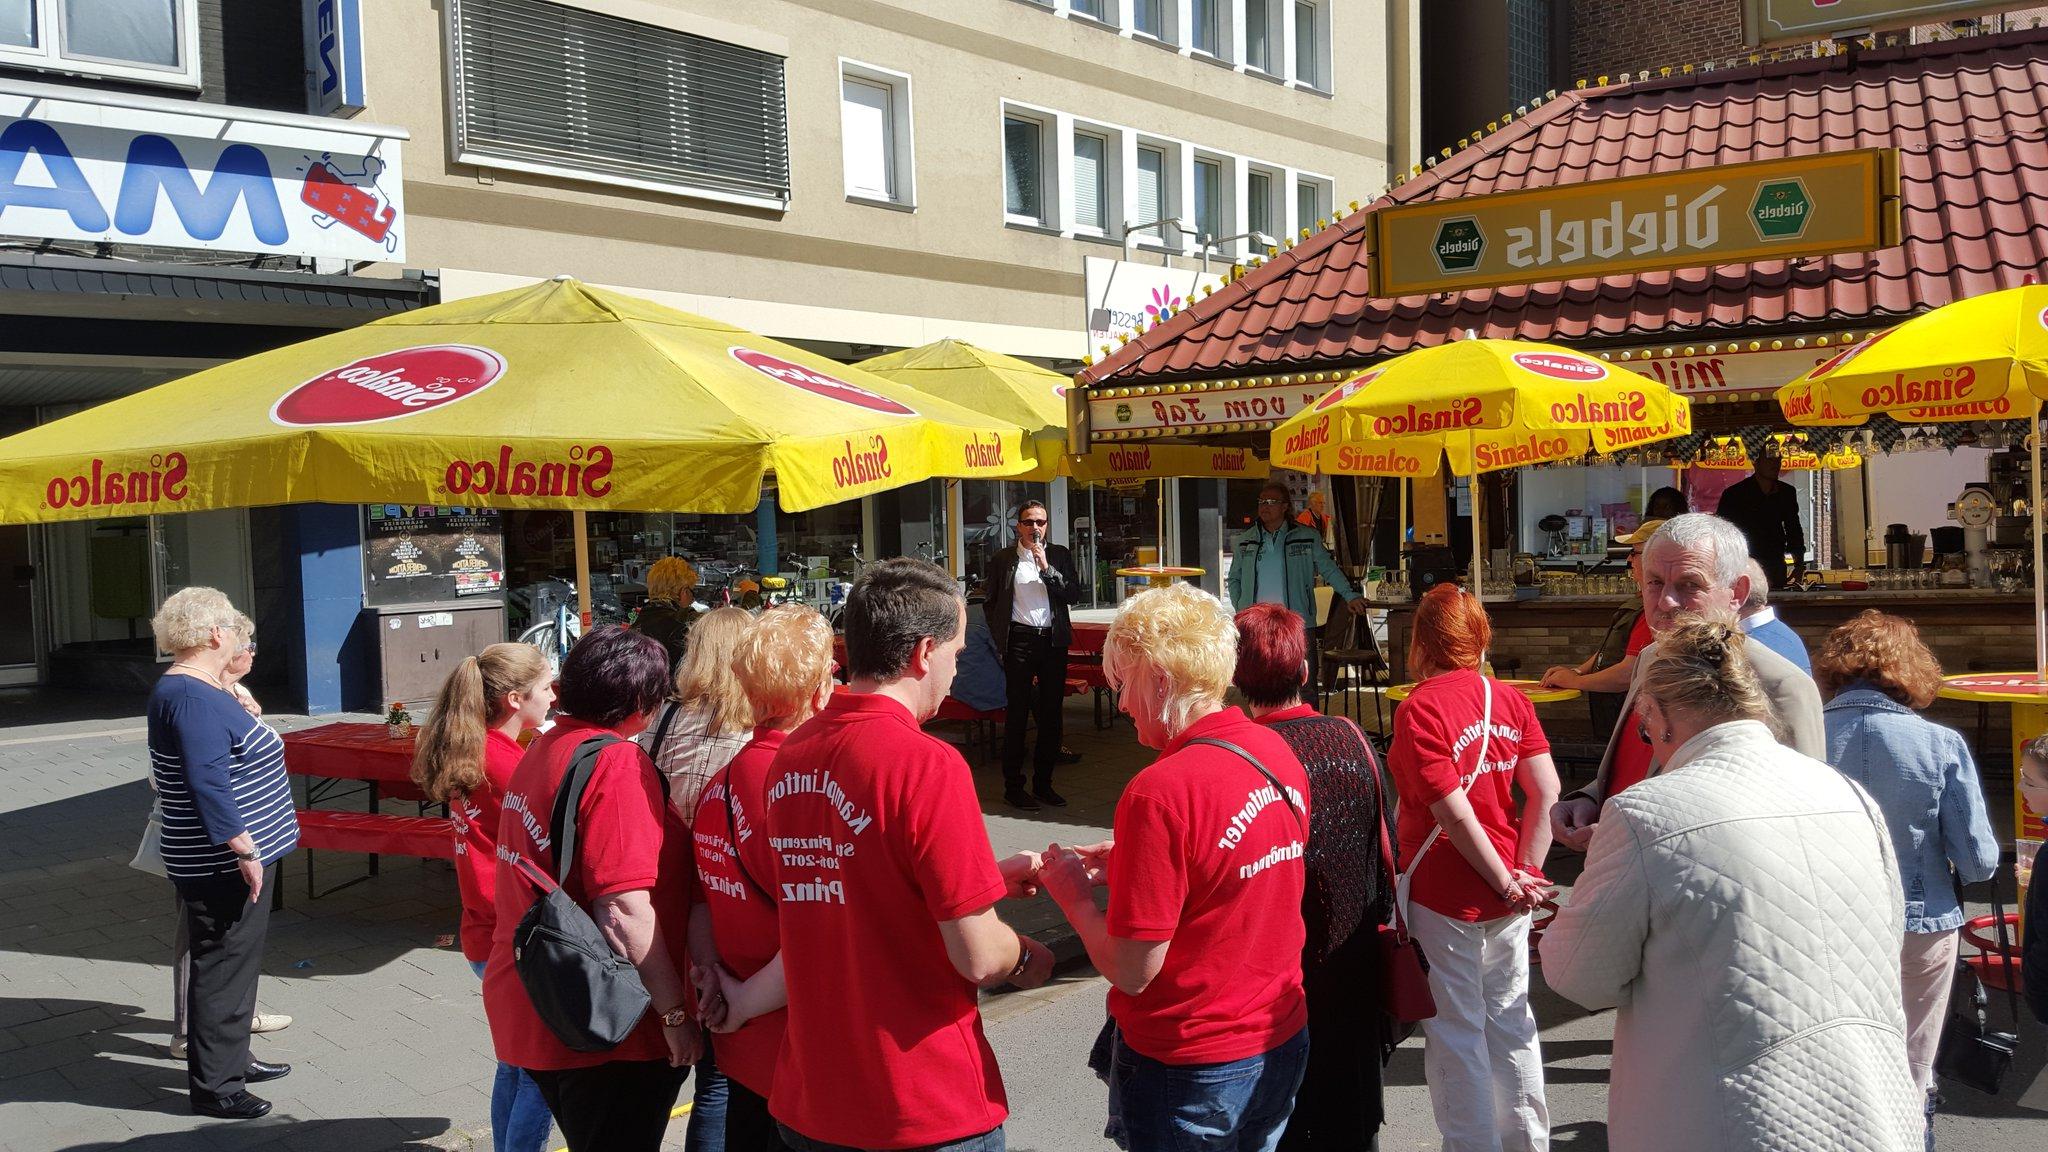 Best And Newest Bürgermeister Eröffnet Vatertagskirmes In Kamp Lintfort – Kamp Lintfort With Regard To Hatten Market Umbrellas (View 16 of 20)